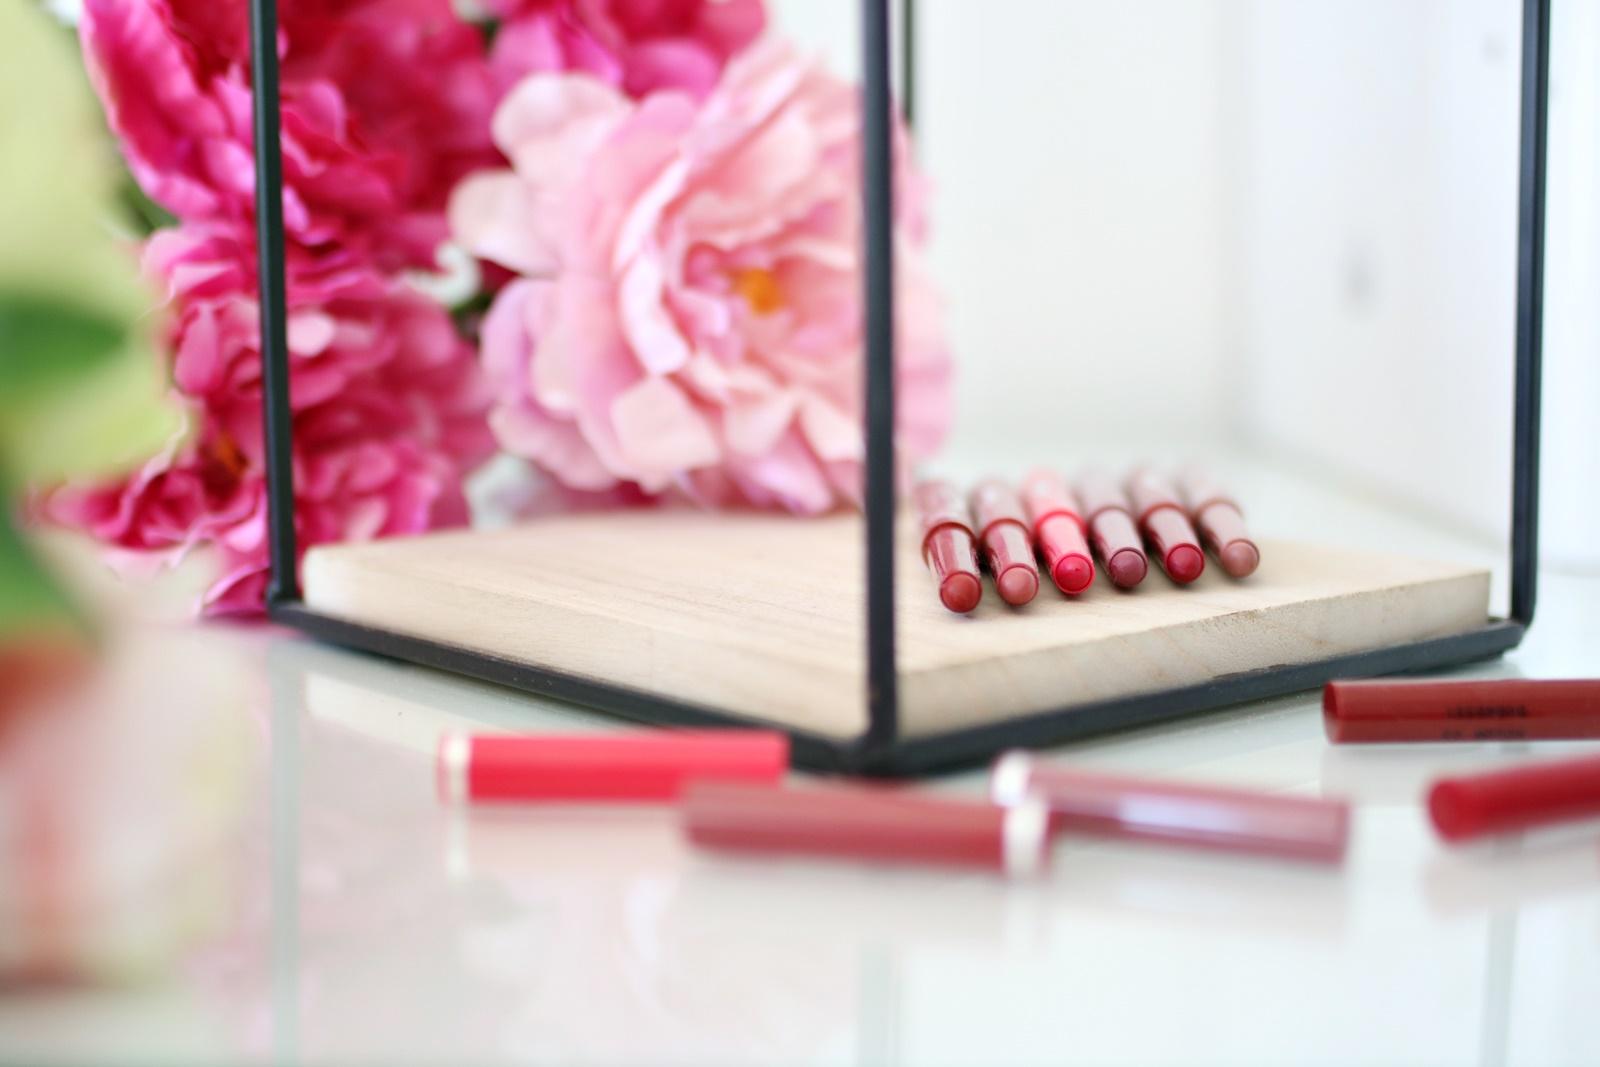 Bell Hypoallergenic Powder Lipstick -pudrowe pomadki w kredce